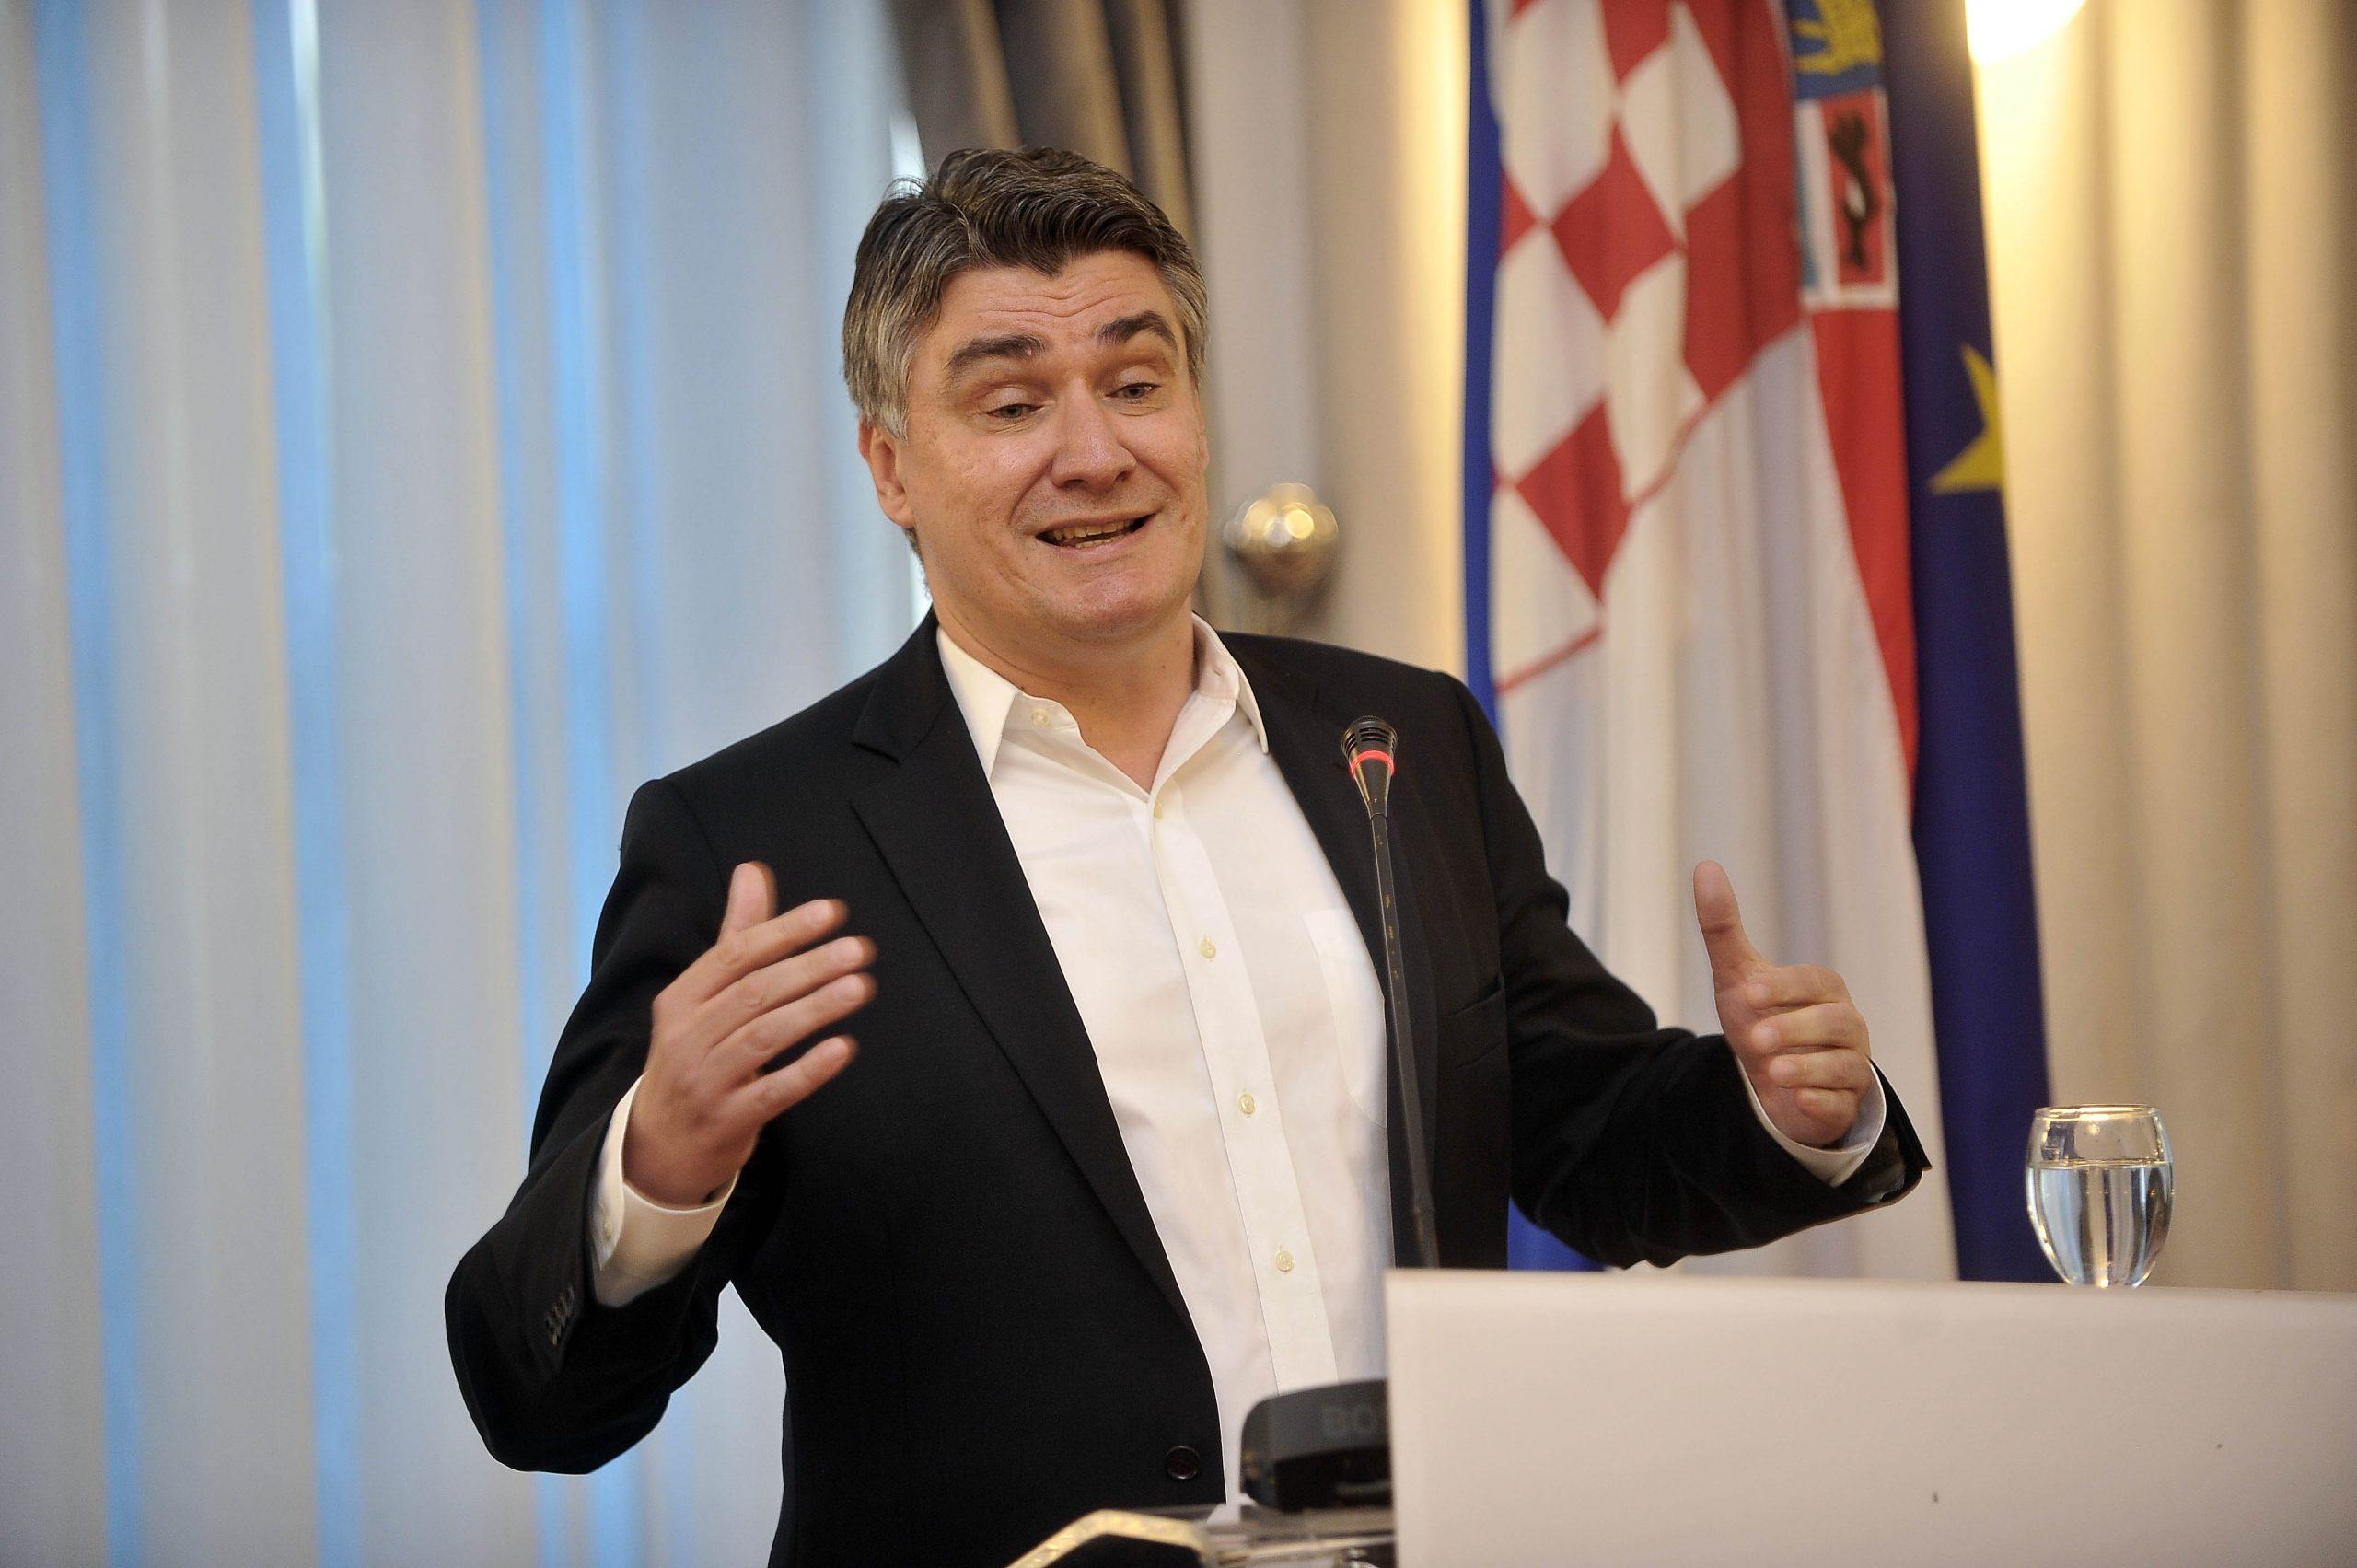 Zoran Milanović, Foto. D. KOVAČEVIĆ